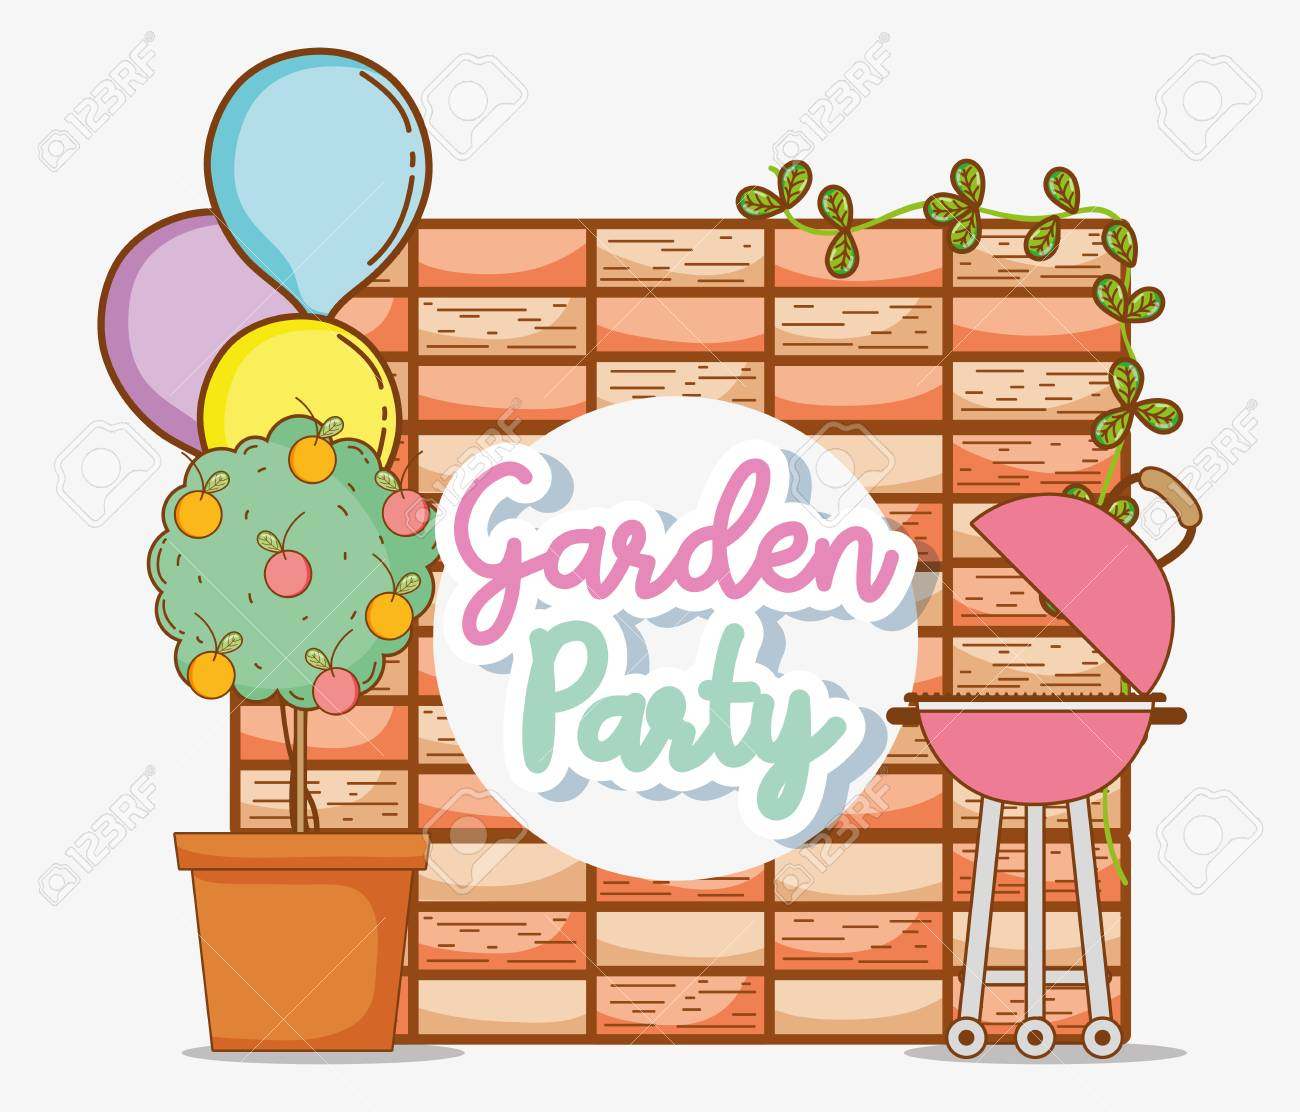 Garden party invitation card with cute cartoons vector illustration garden party invitation card with cute cartoons vector illustration graphic design stock vector 98666657 stopboris Choice Image